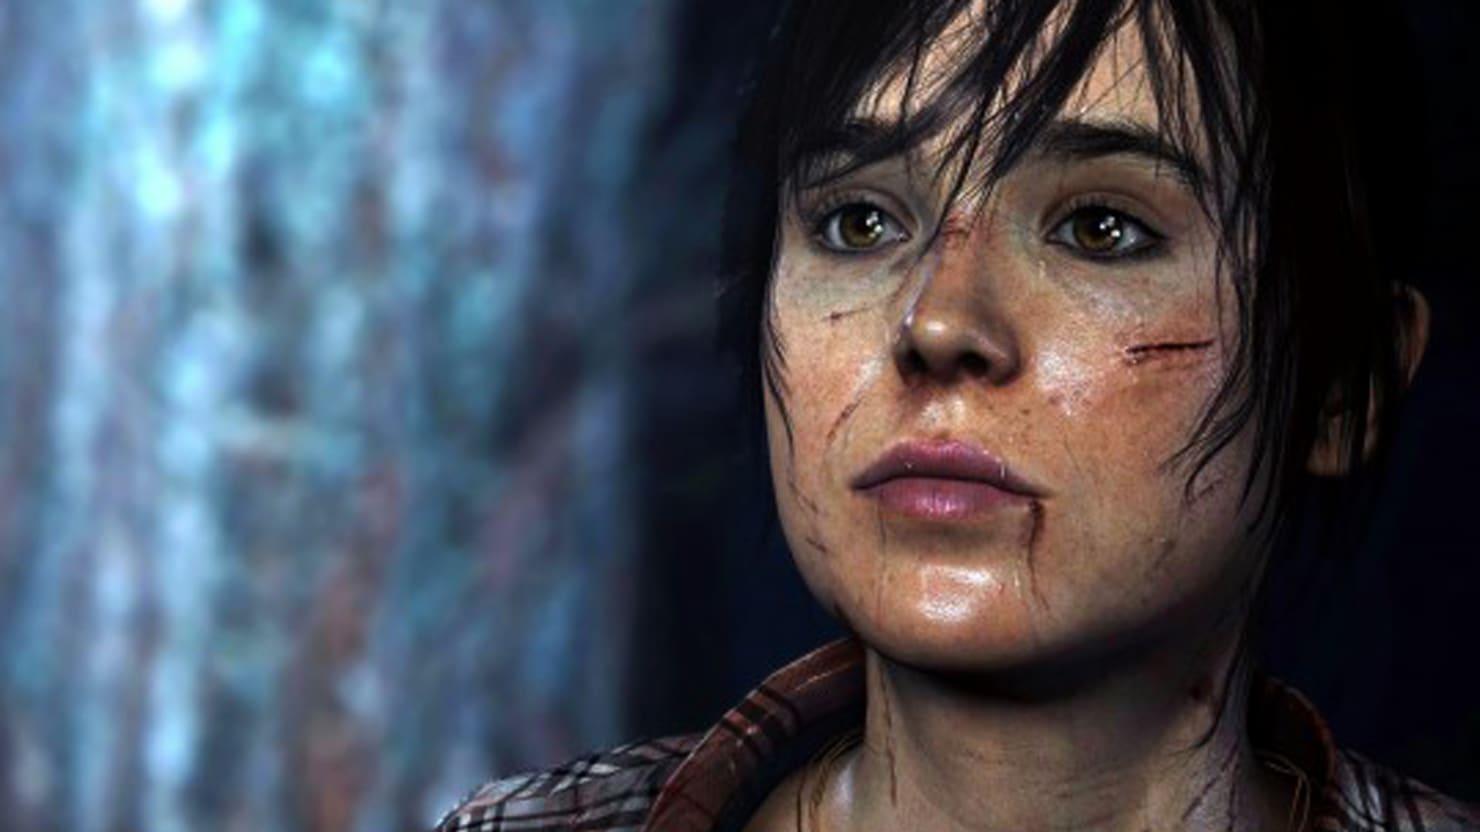 Ellen Page On Starring In 'Beyond Two Souls'